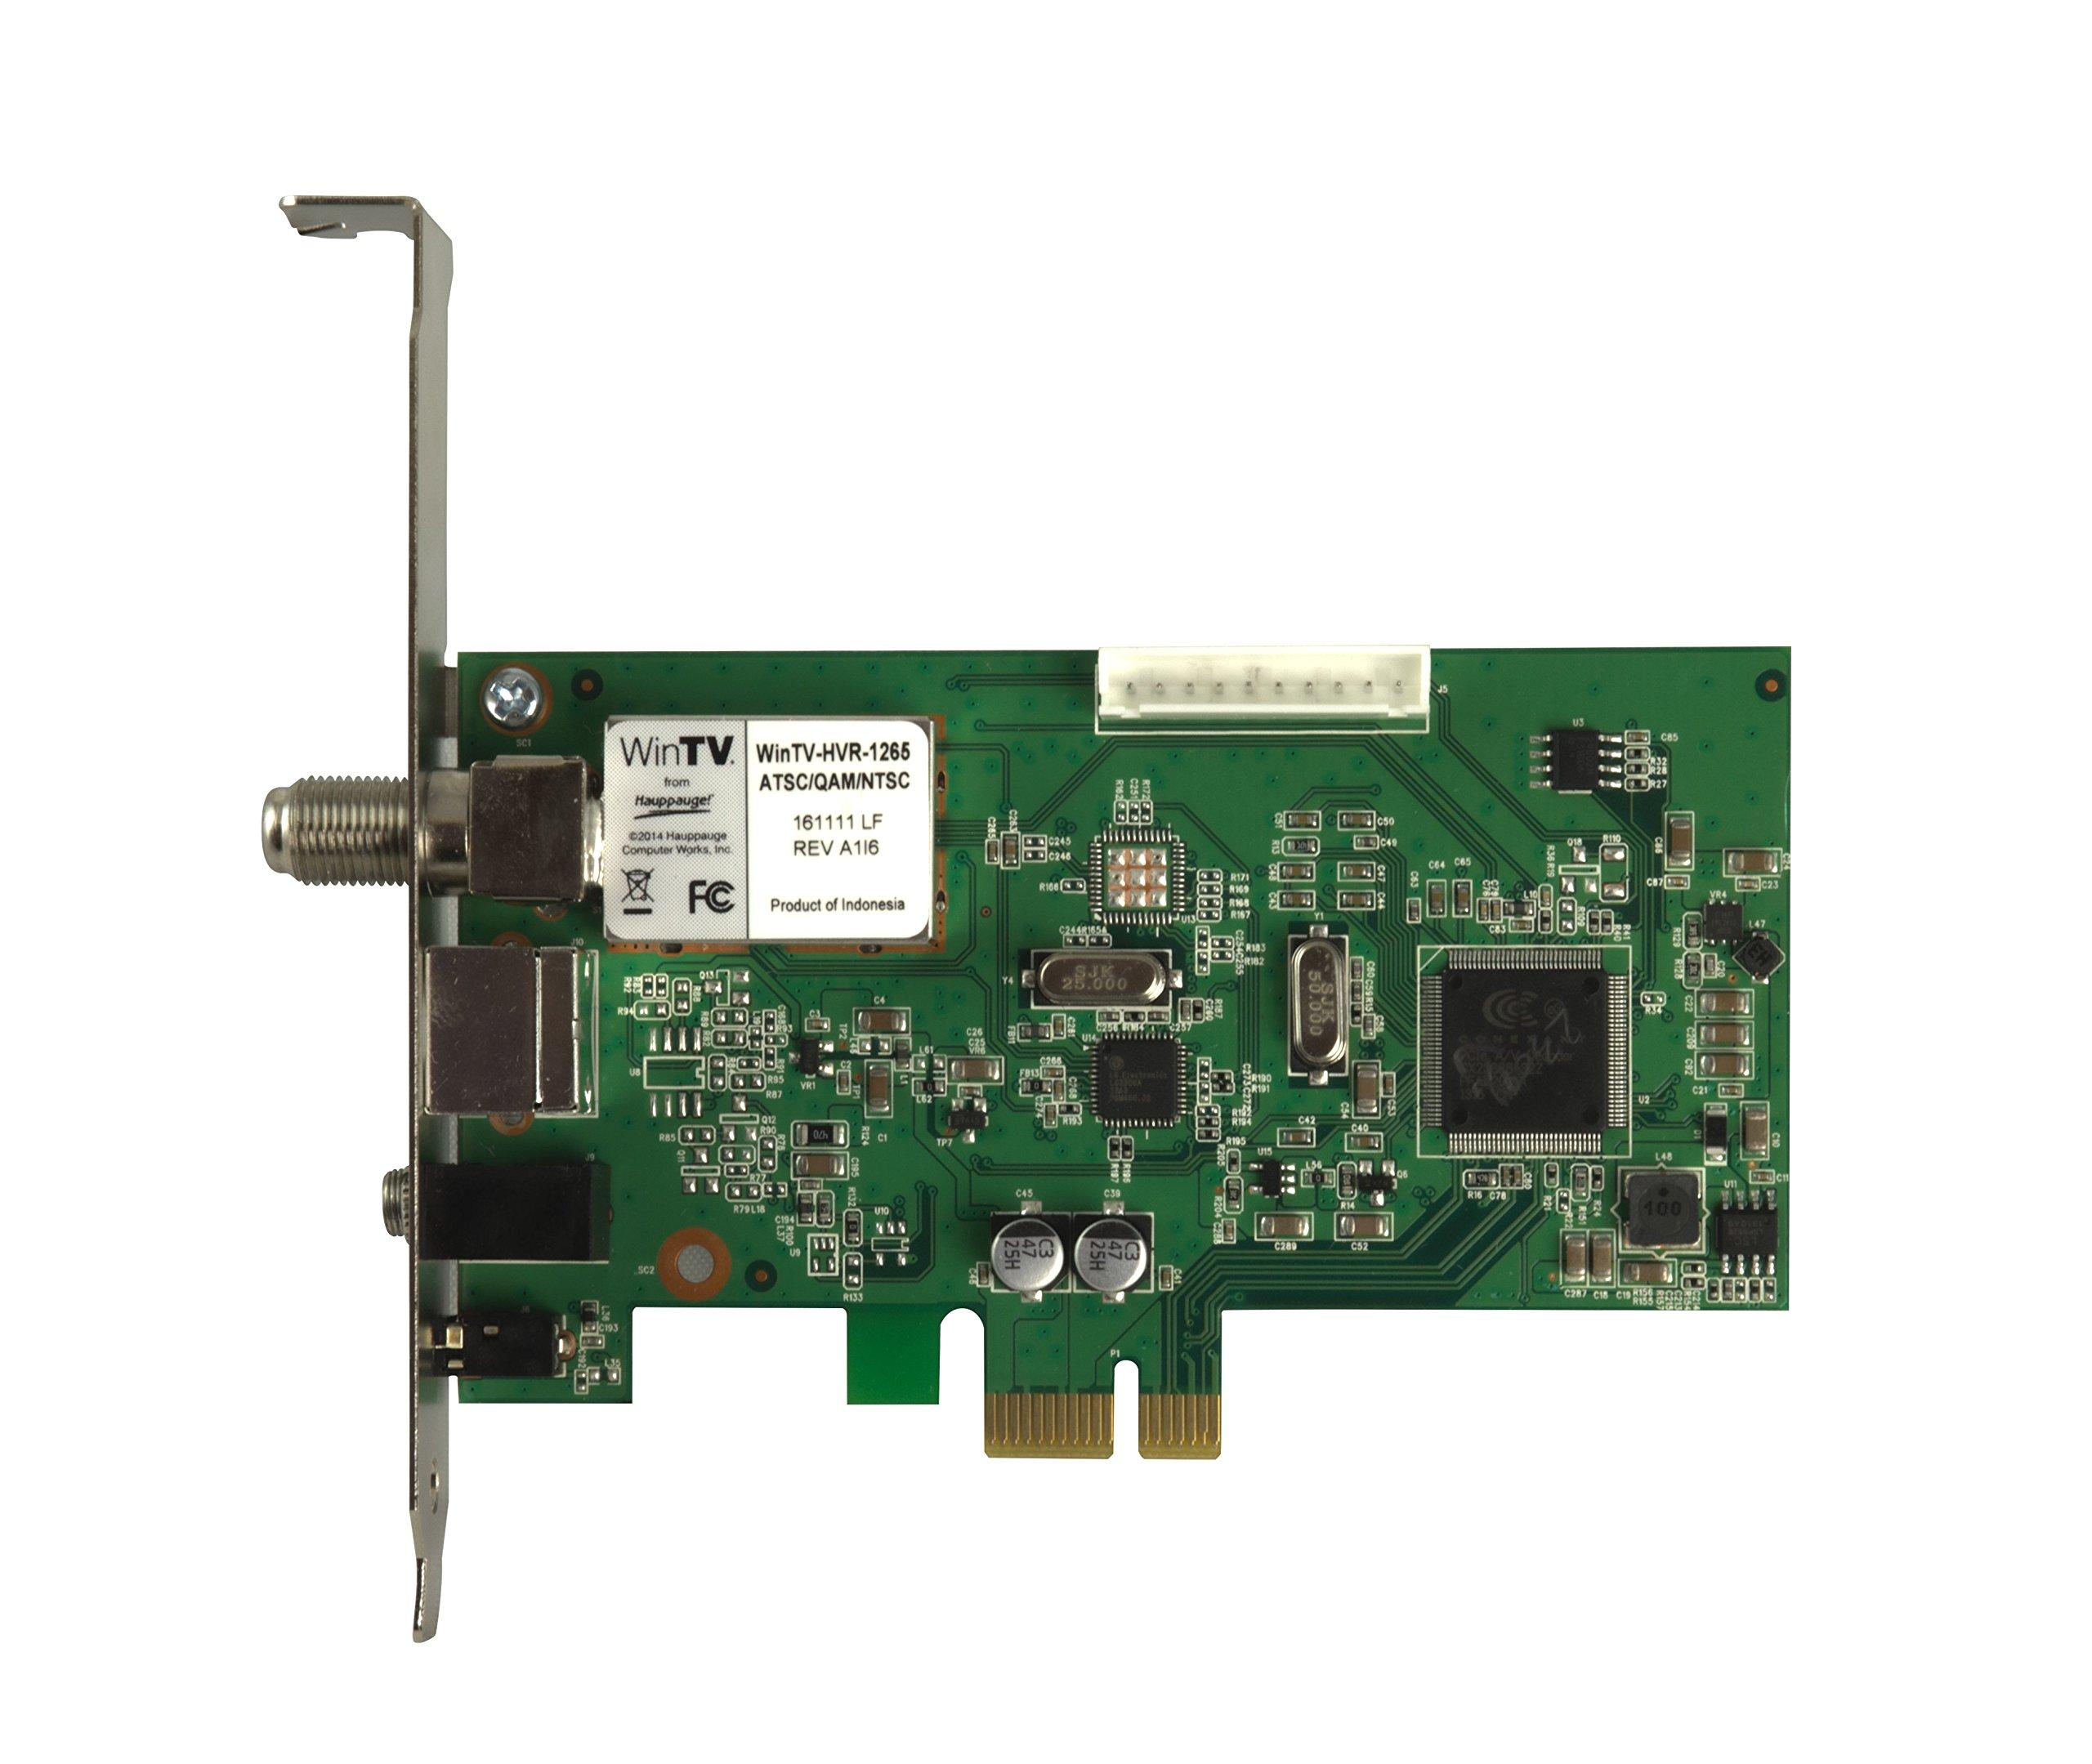 Hauppauge 1196 WinTV HVR-1265 PCI Express Hybrid High Definition TV Tuner Card by Hauppauge